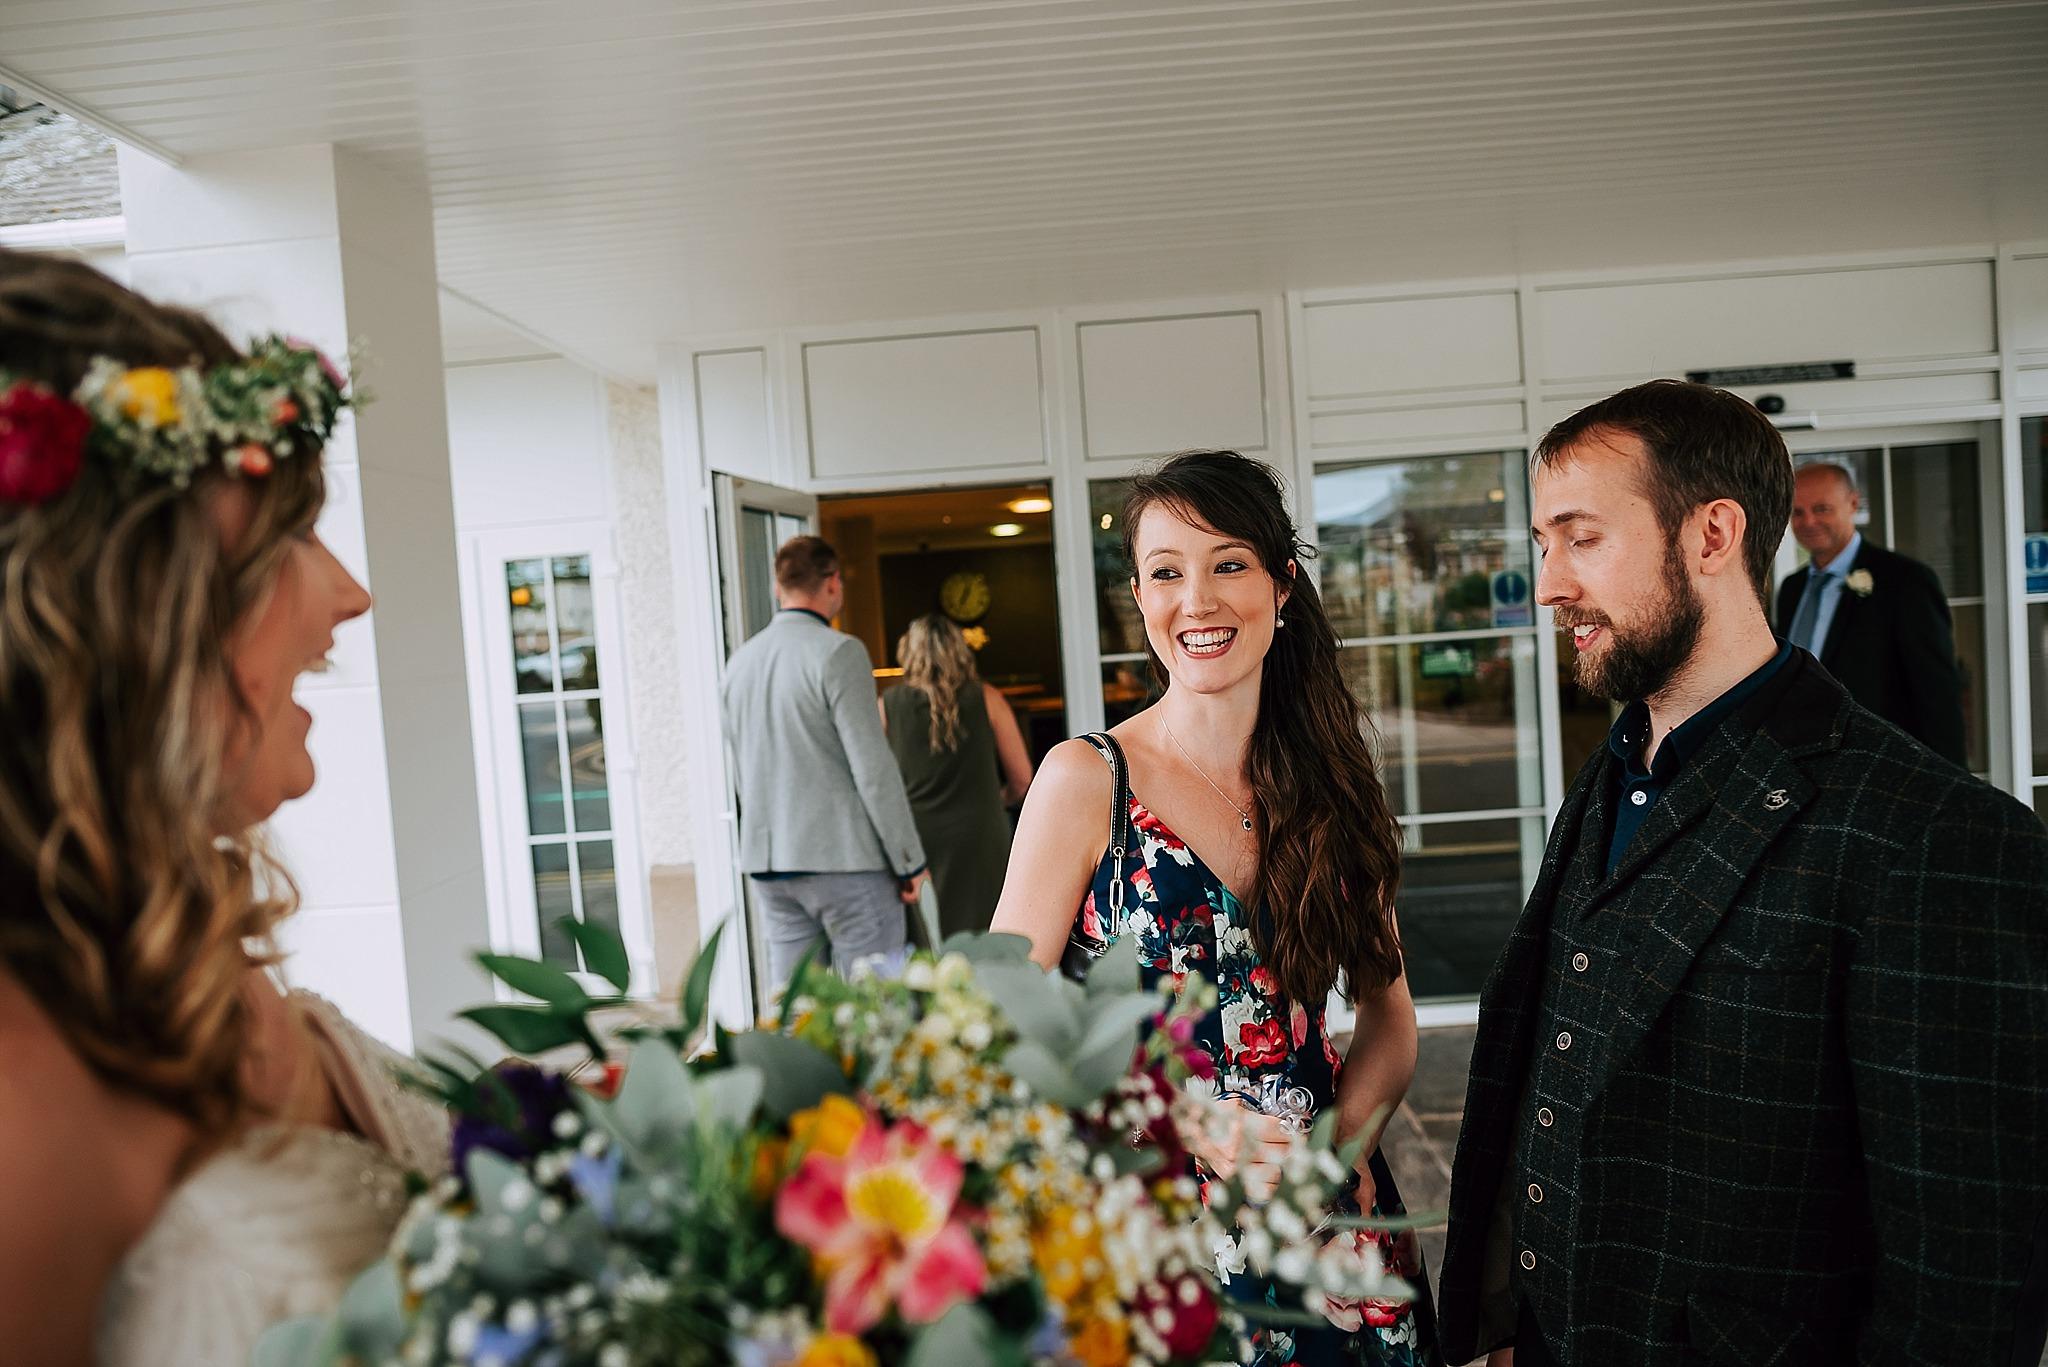 summer wedding at ribby hall village on the fylde coast